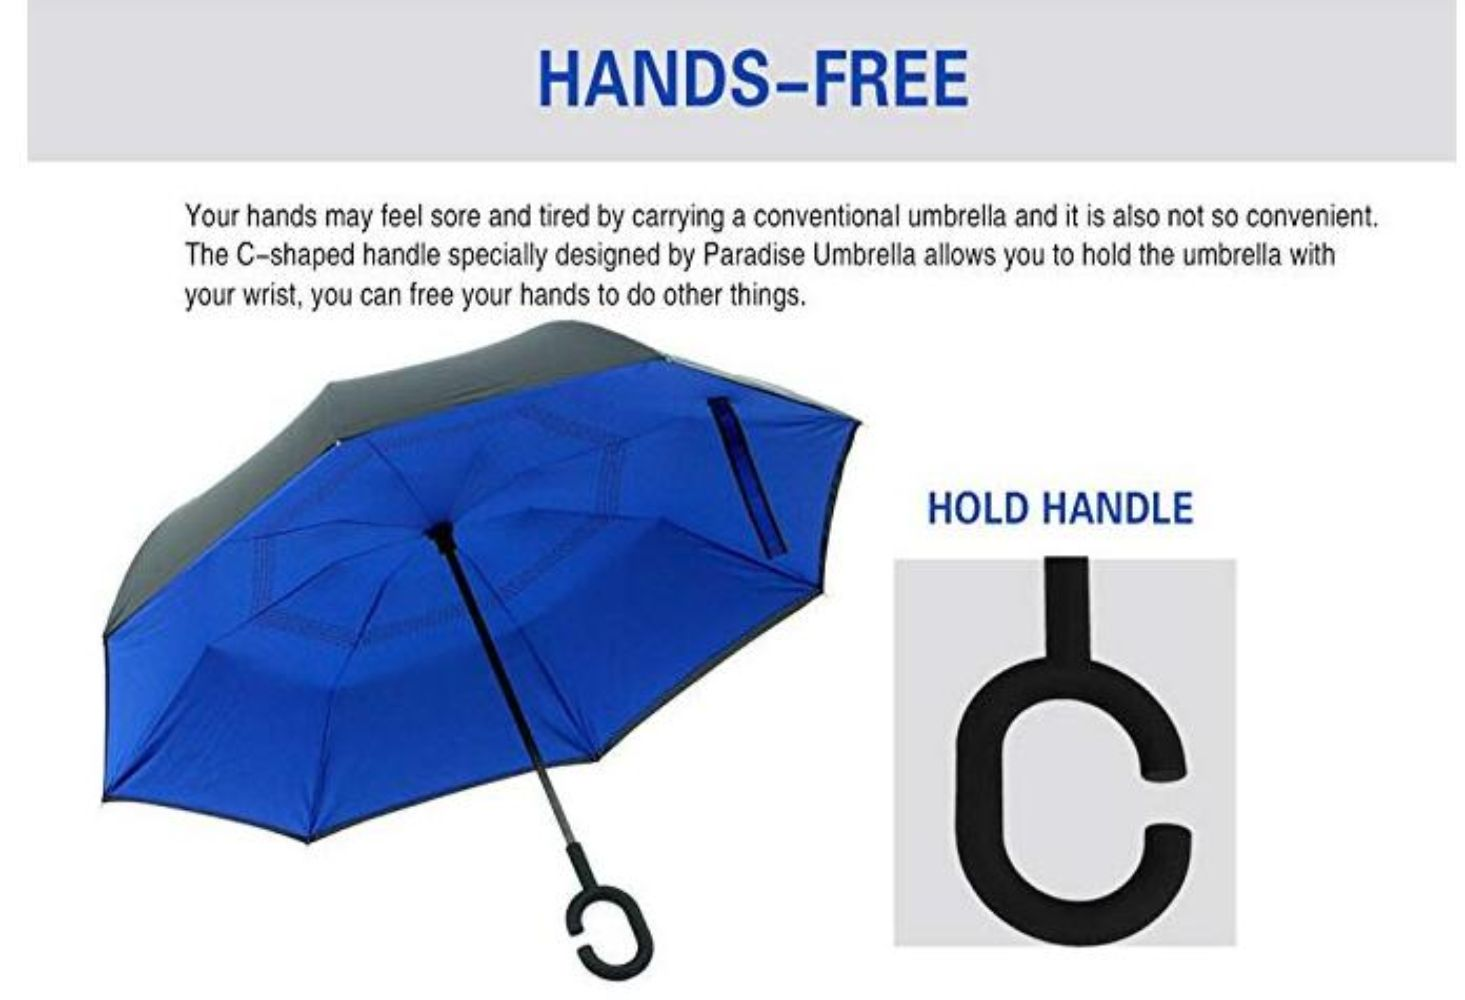 The Legend Of Zelda Car Reverse Umbrella Windproof And Rainproof Double Folding Inverted Umbrella With C-Shaped Handle UV Protection Inverted Folding Umbrellas